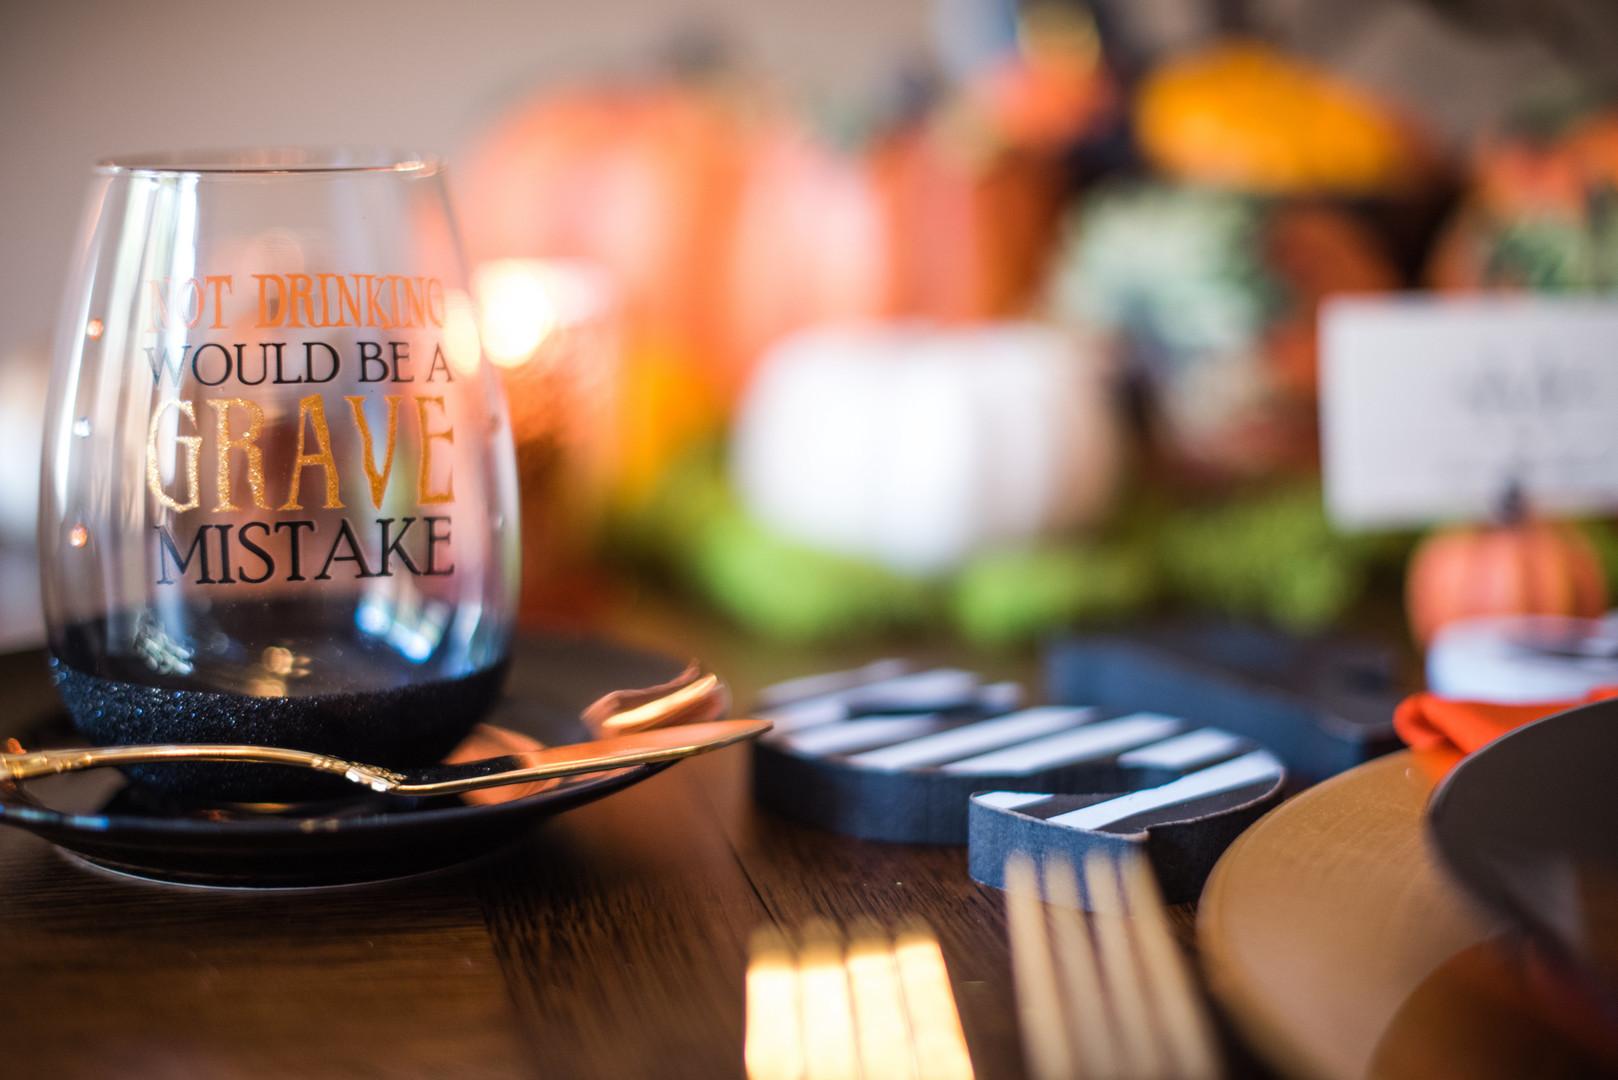 halloween wine glass on table